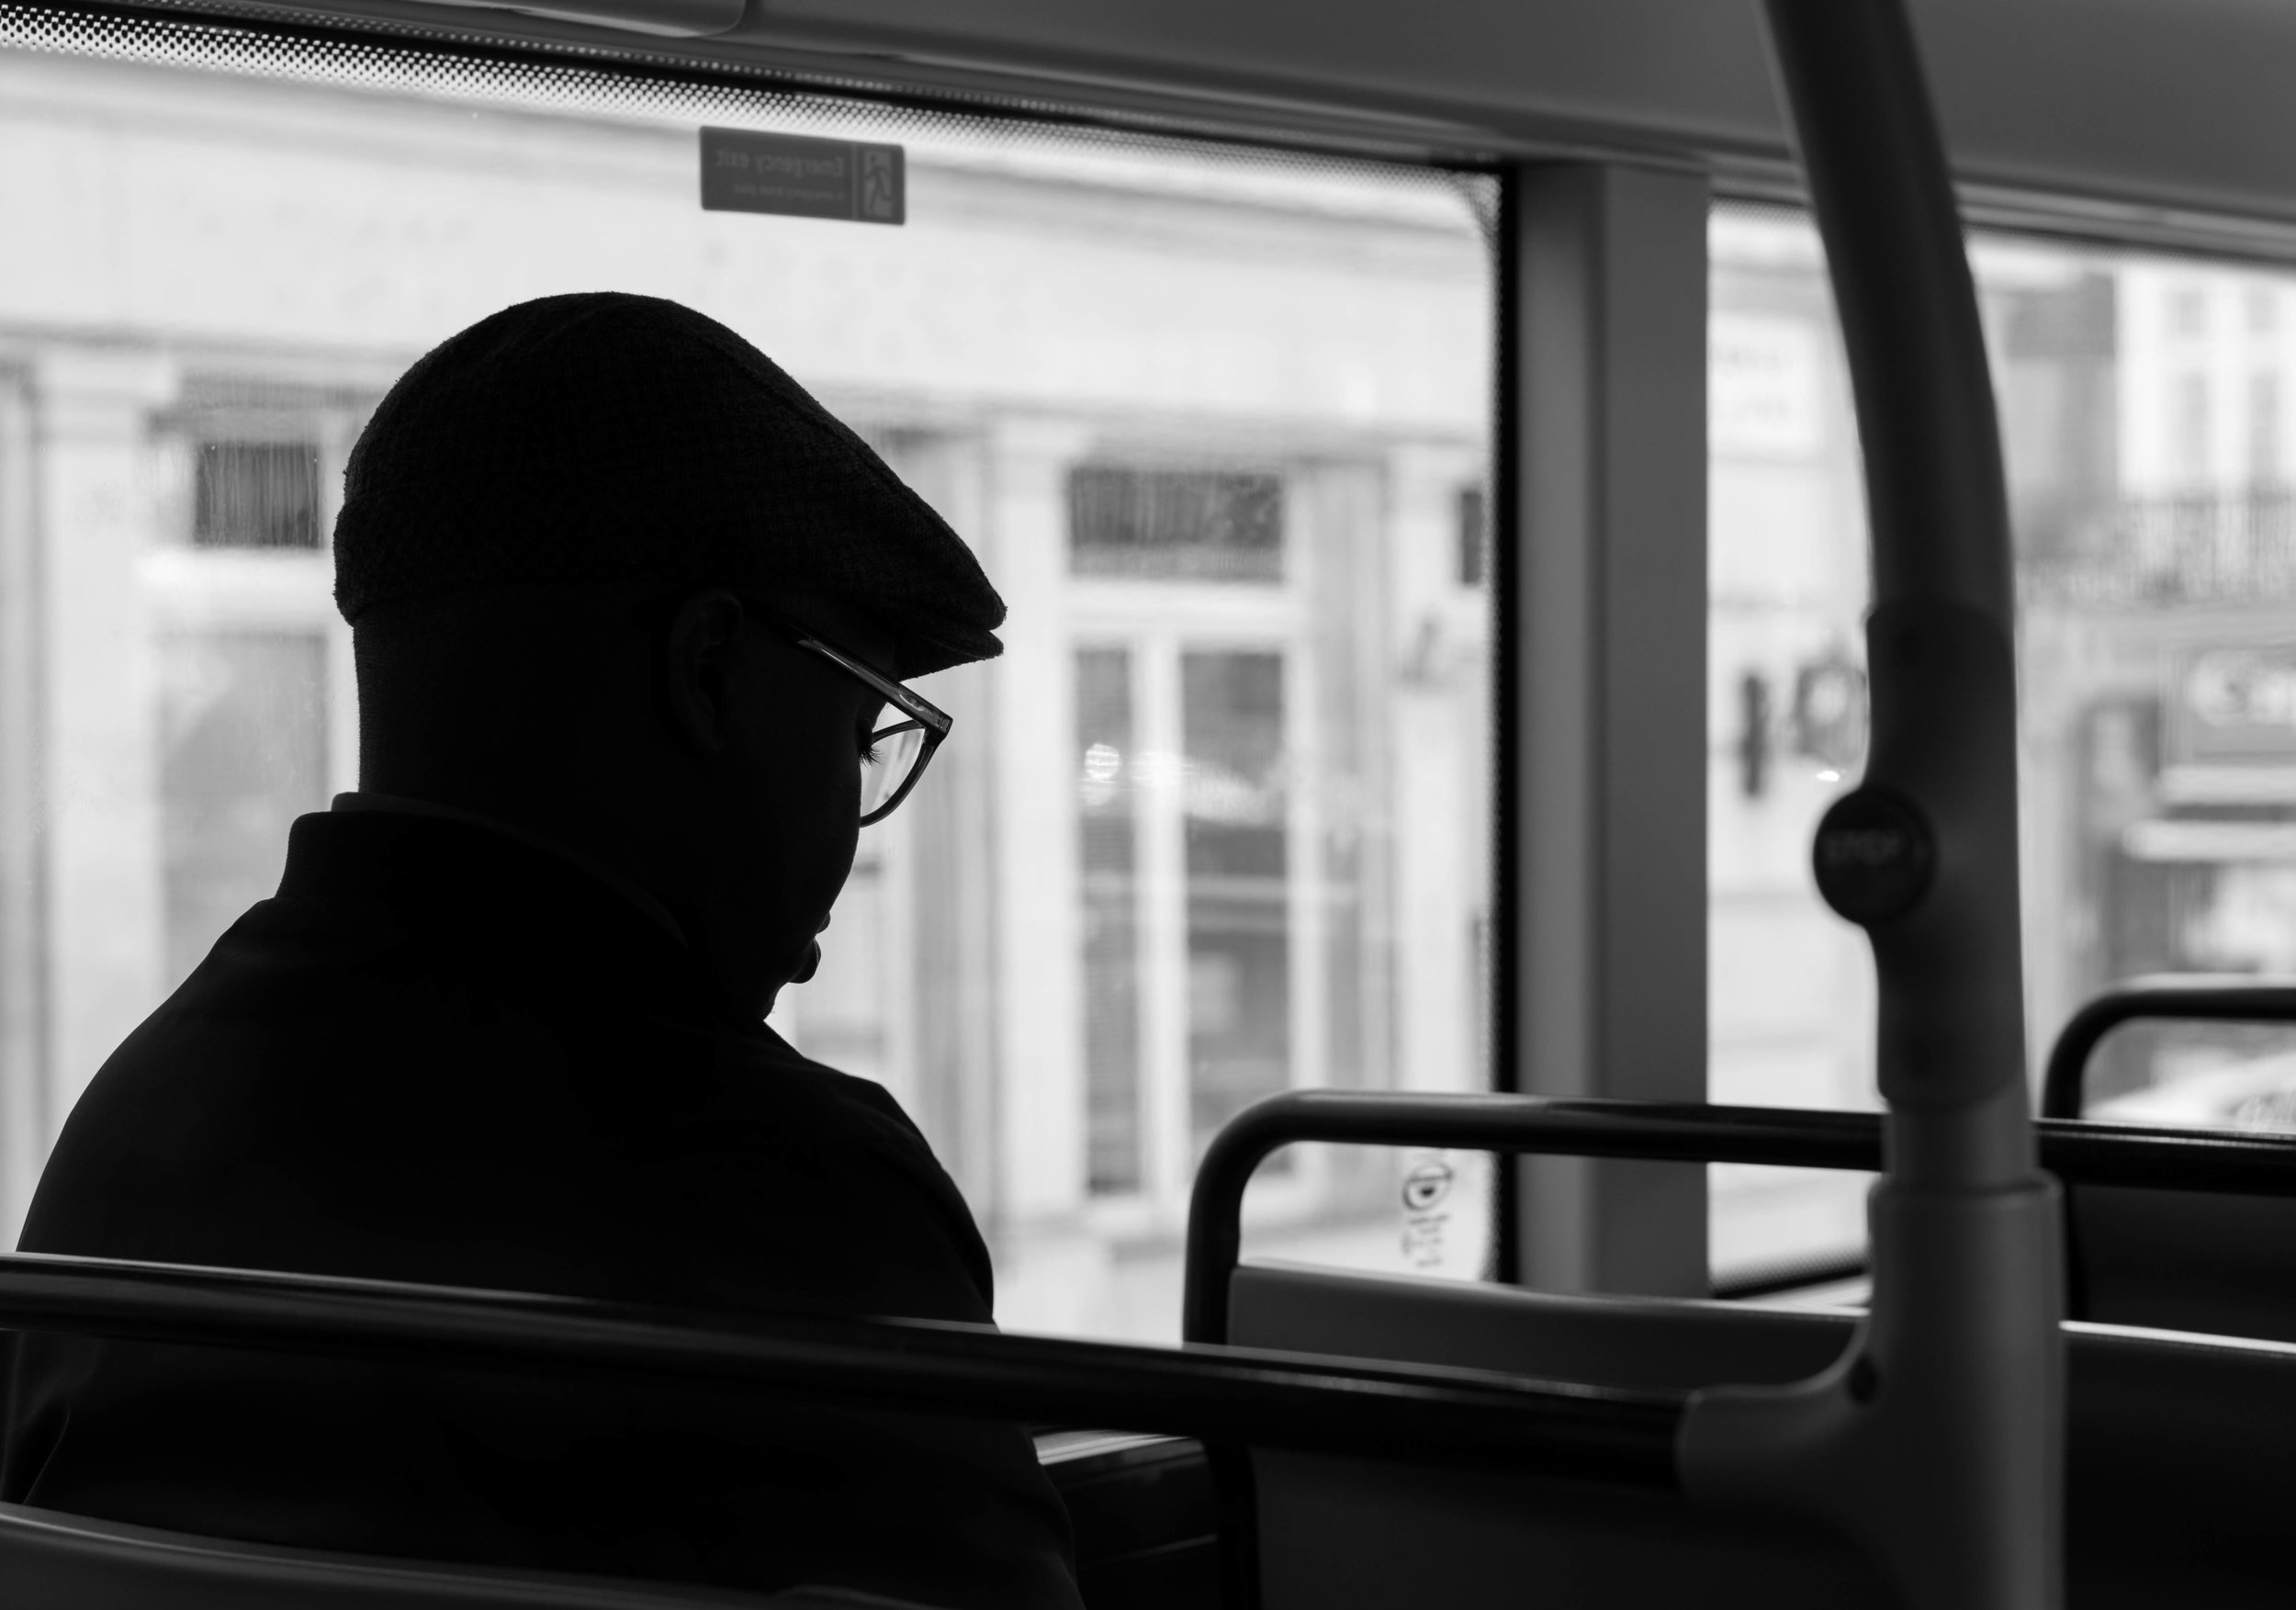 DoubleDecker_Bus.jpg